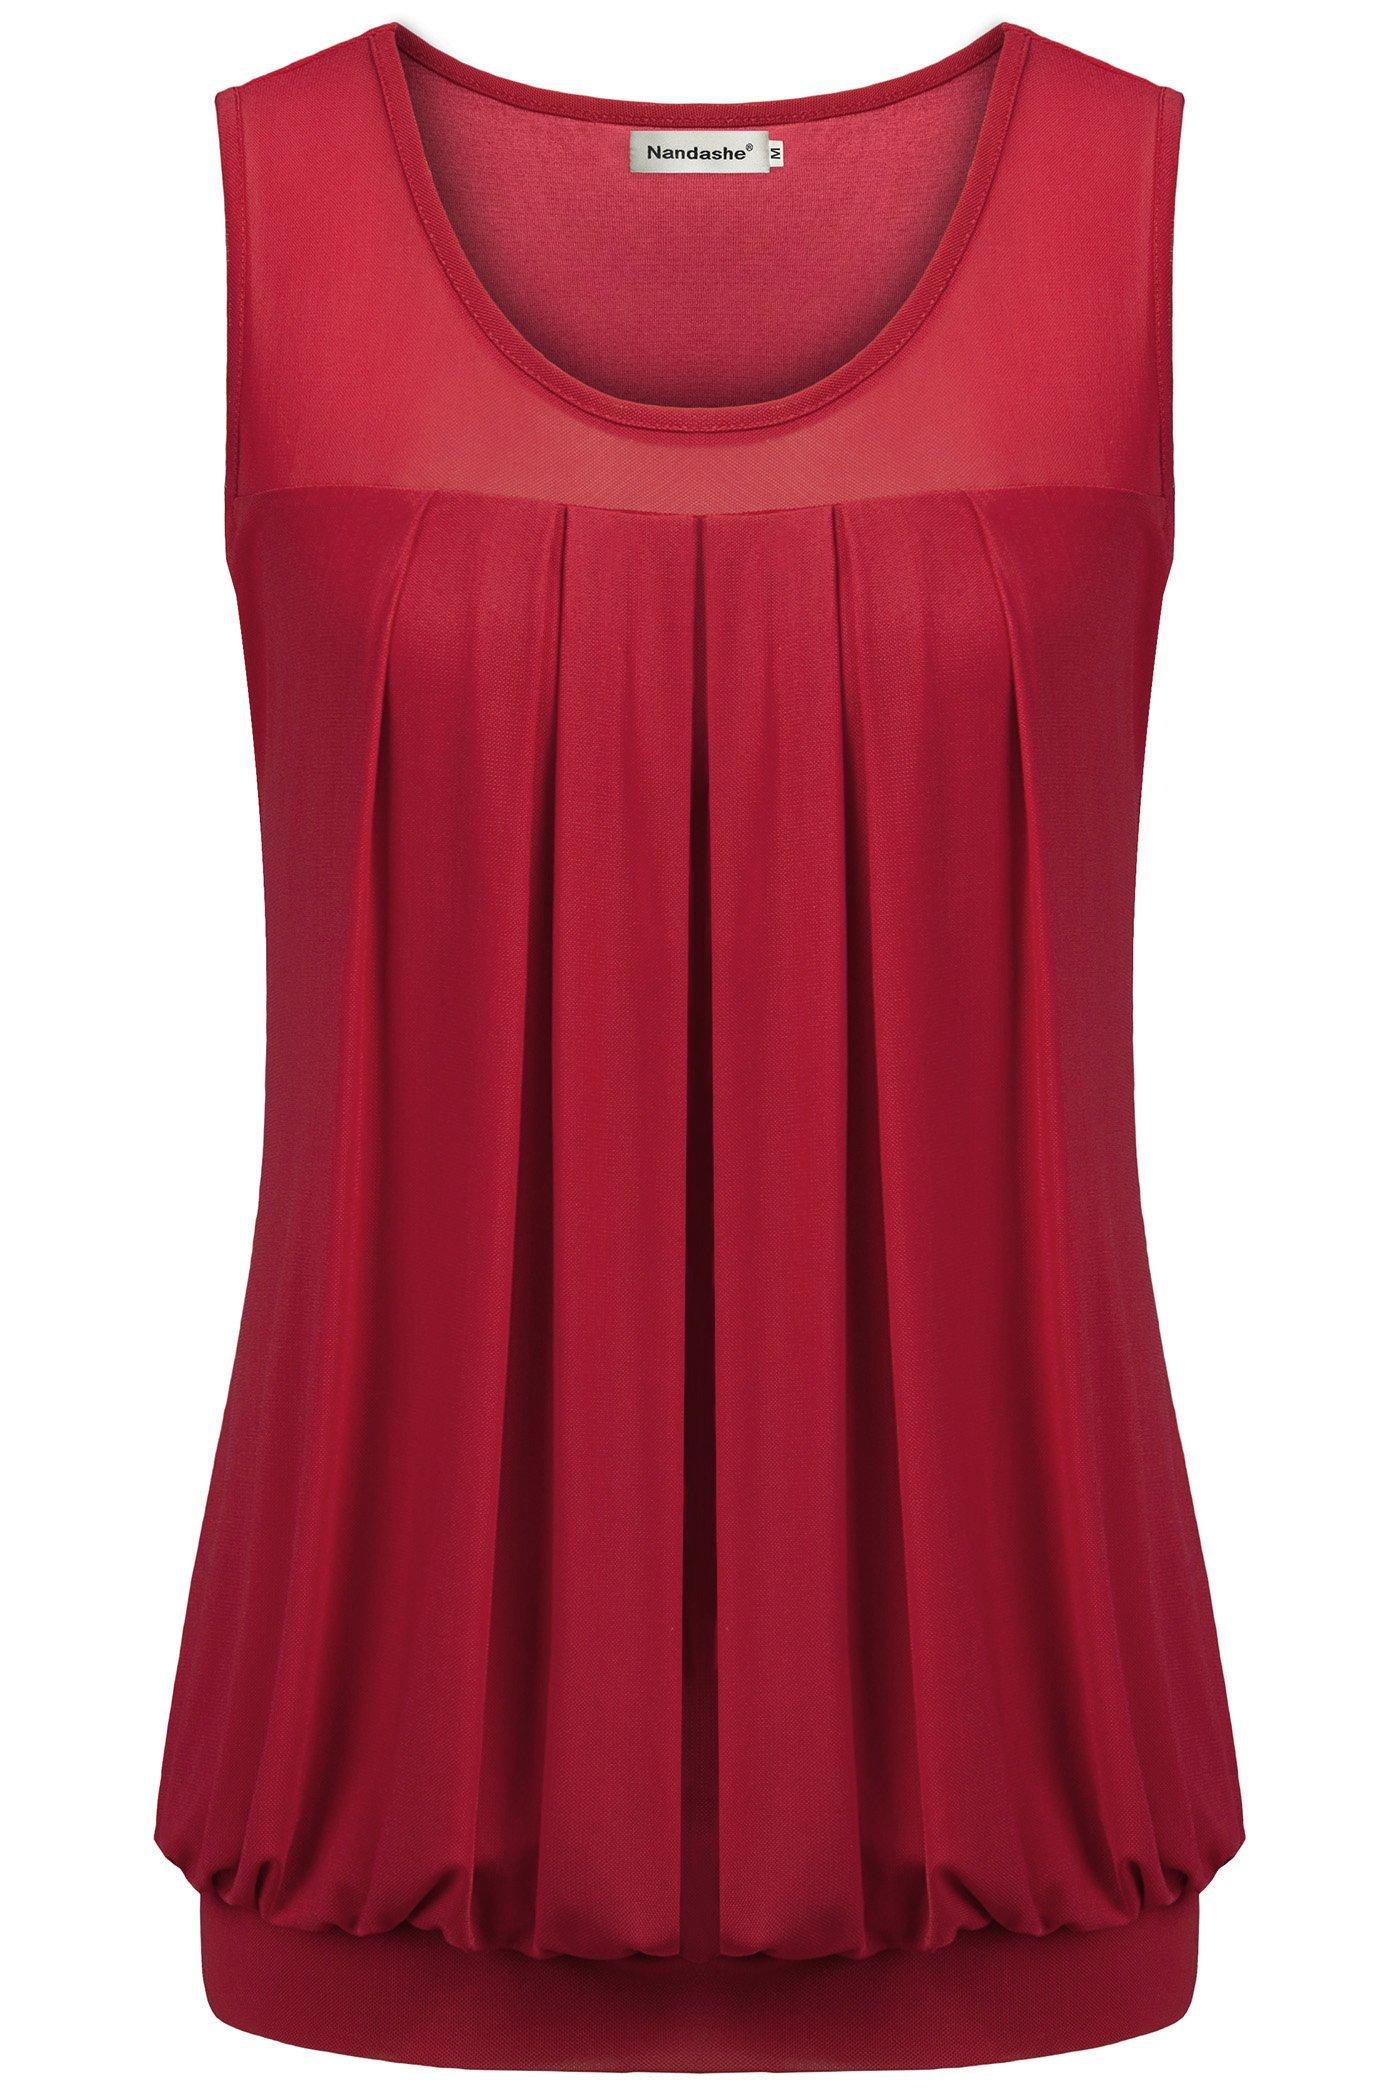 Nandashe Chiffon Blouses Women, Teen Big Girls Plus Size Crewl Neck Layered Knitting Comfortable Casual Active Dress Tshirt Date Wear Sports Undershirts XXL